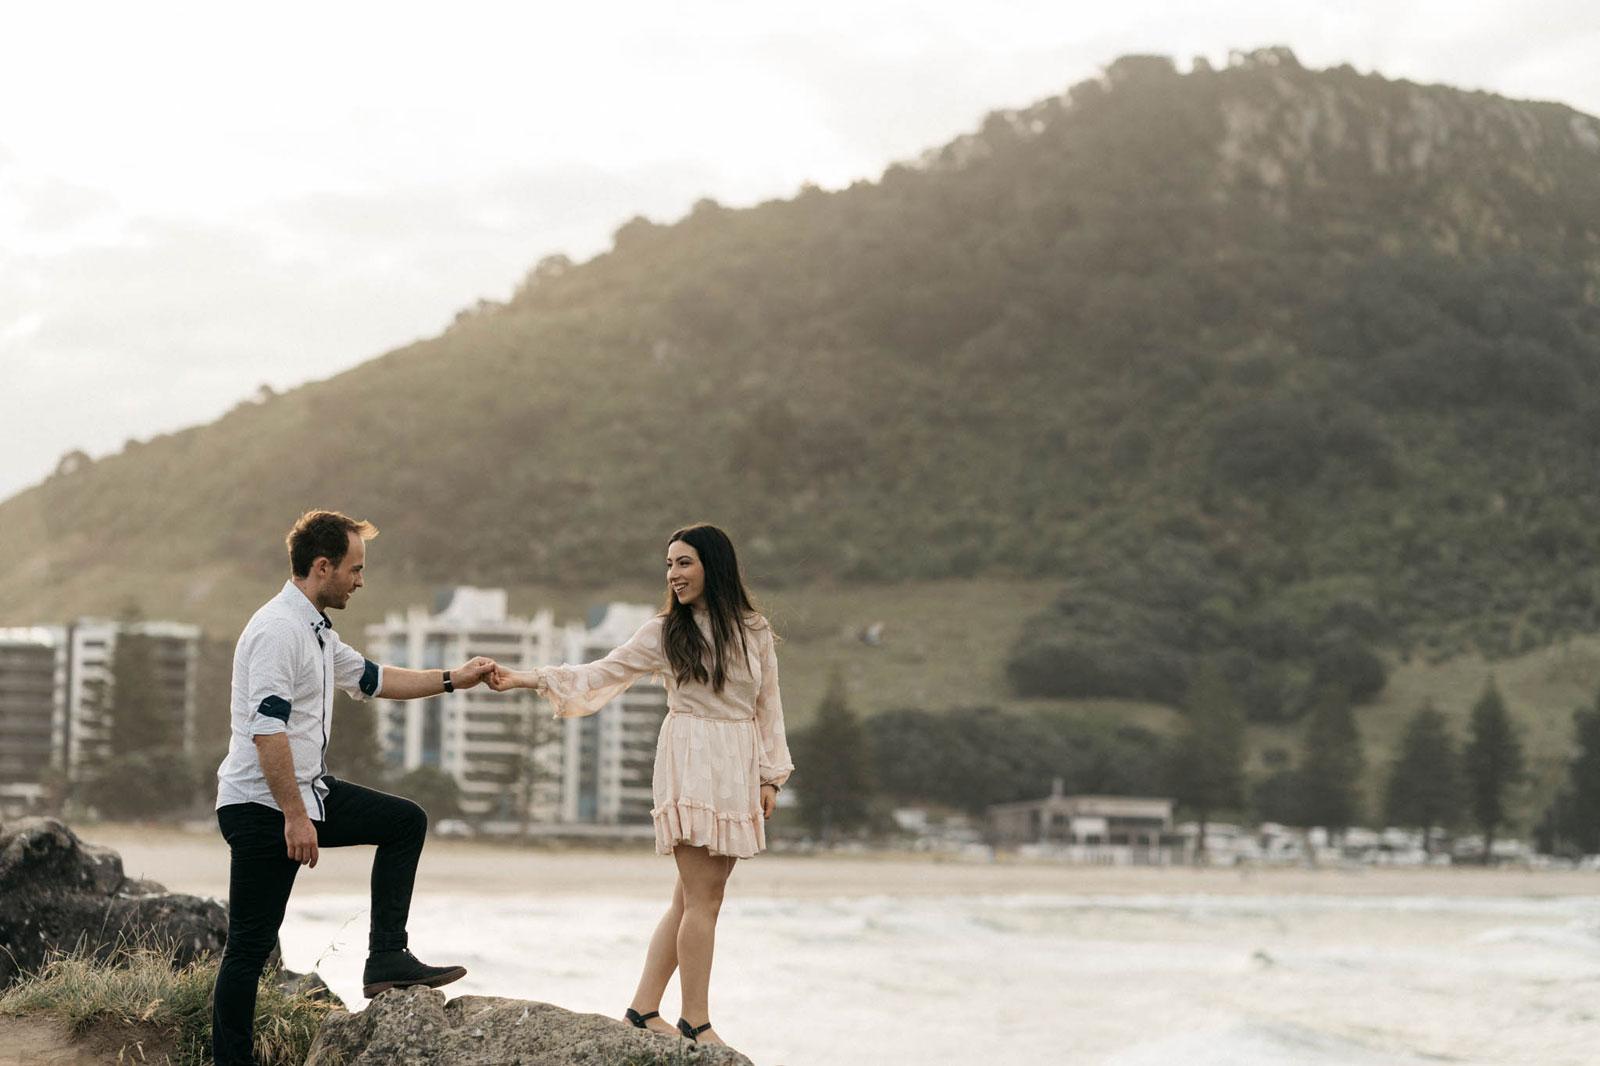 newfound-e-m-mt-maunganui-tauranga-wedding-photographer-018-a